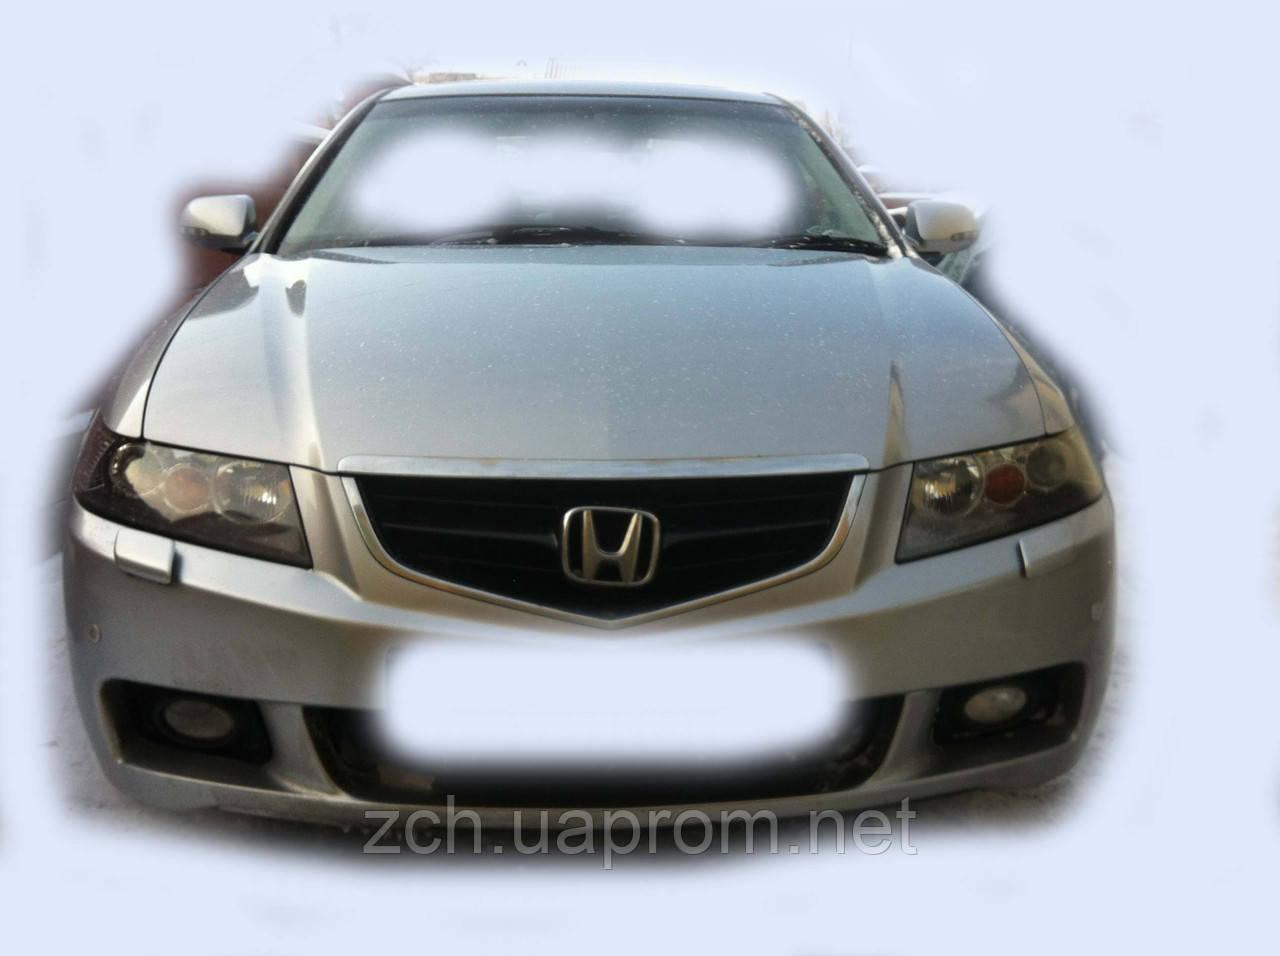 Противотуманные фары Honda Accord